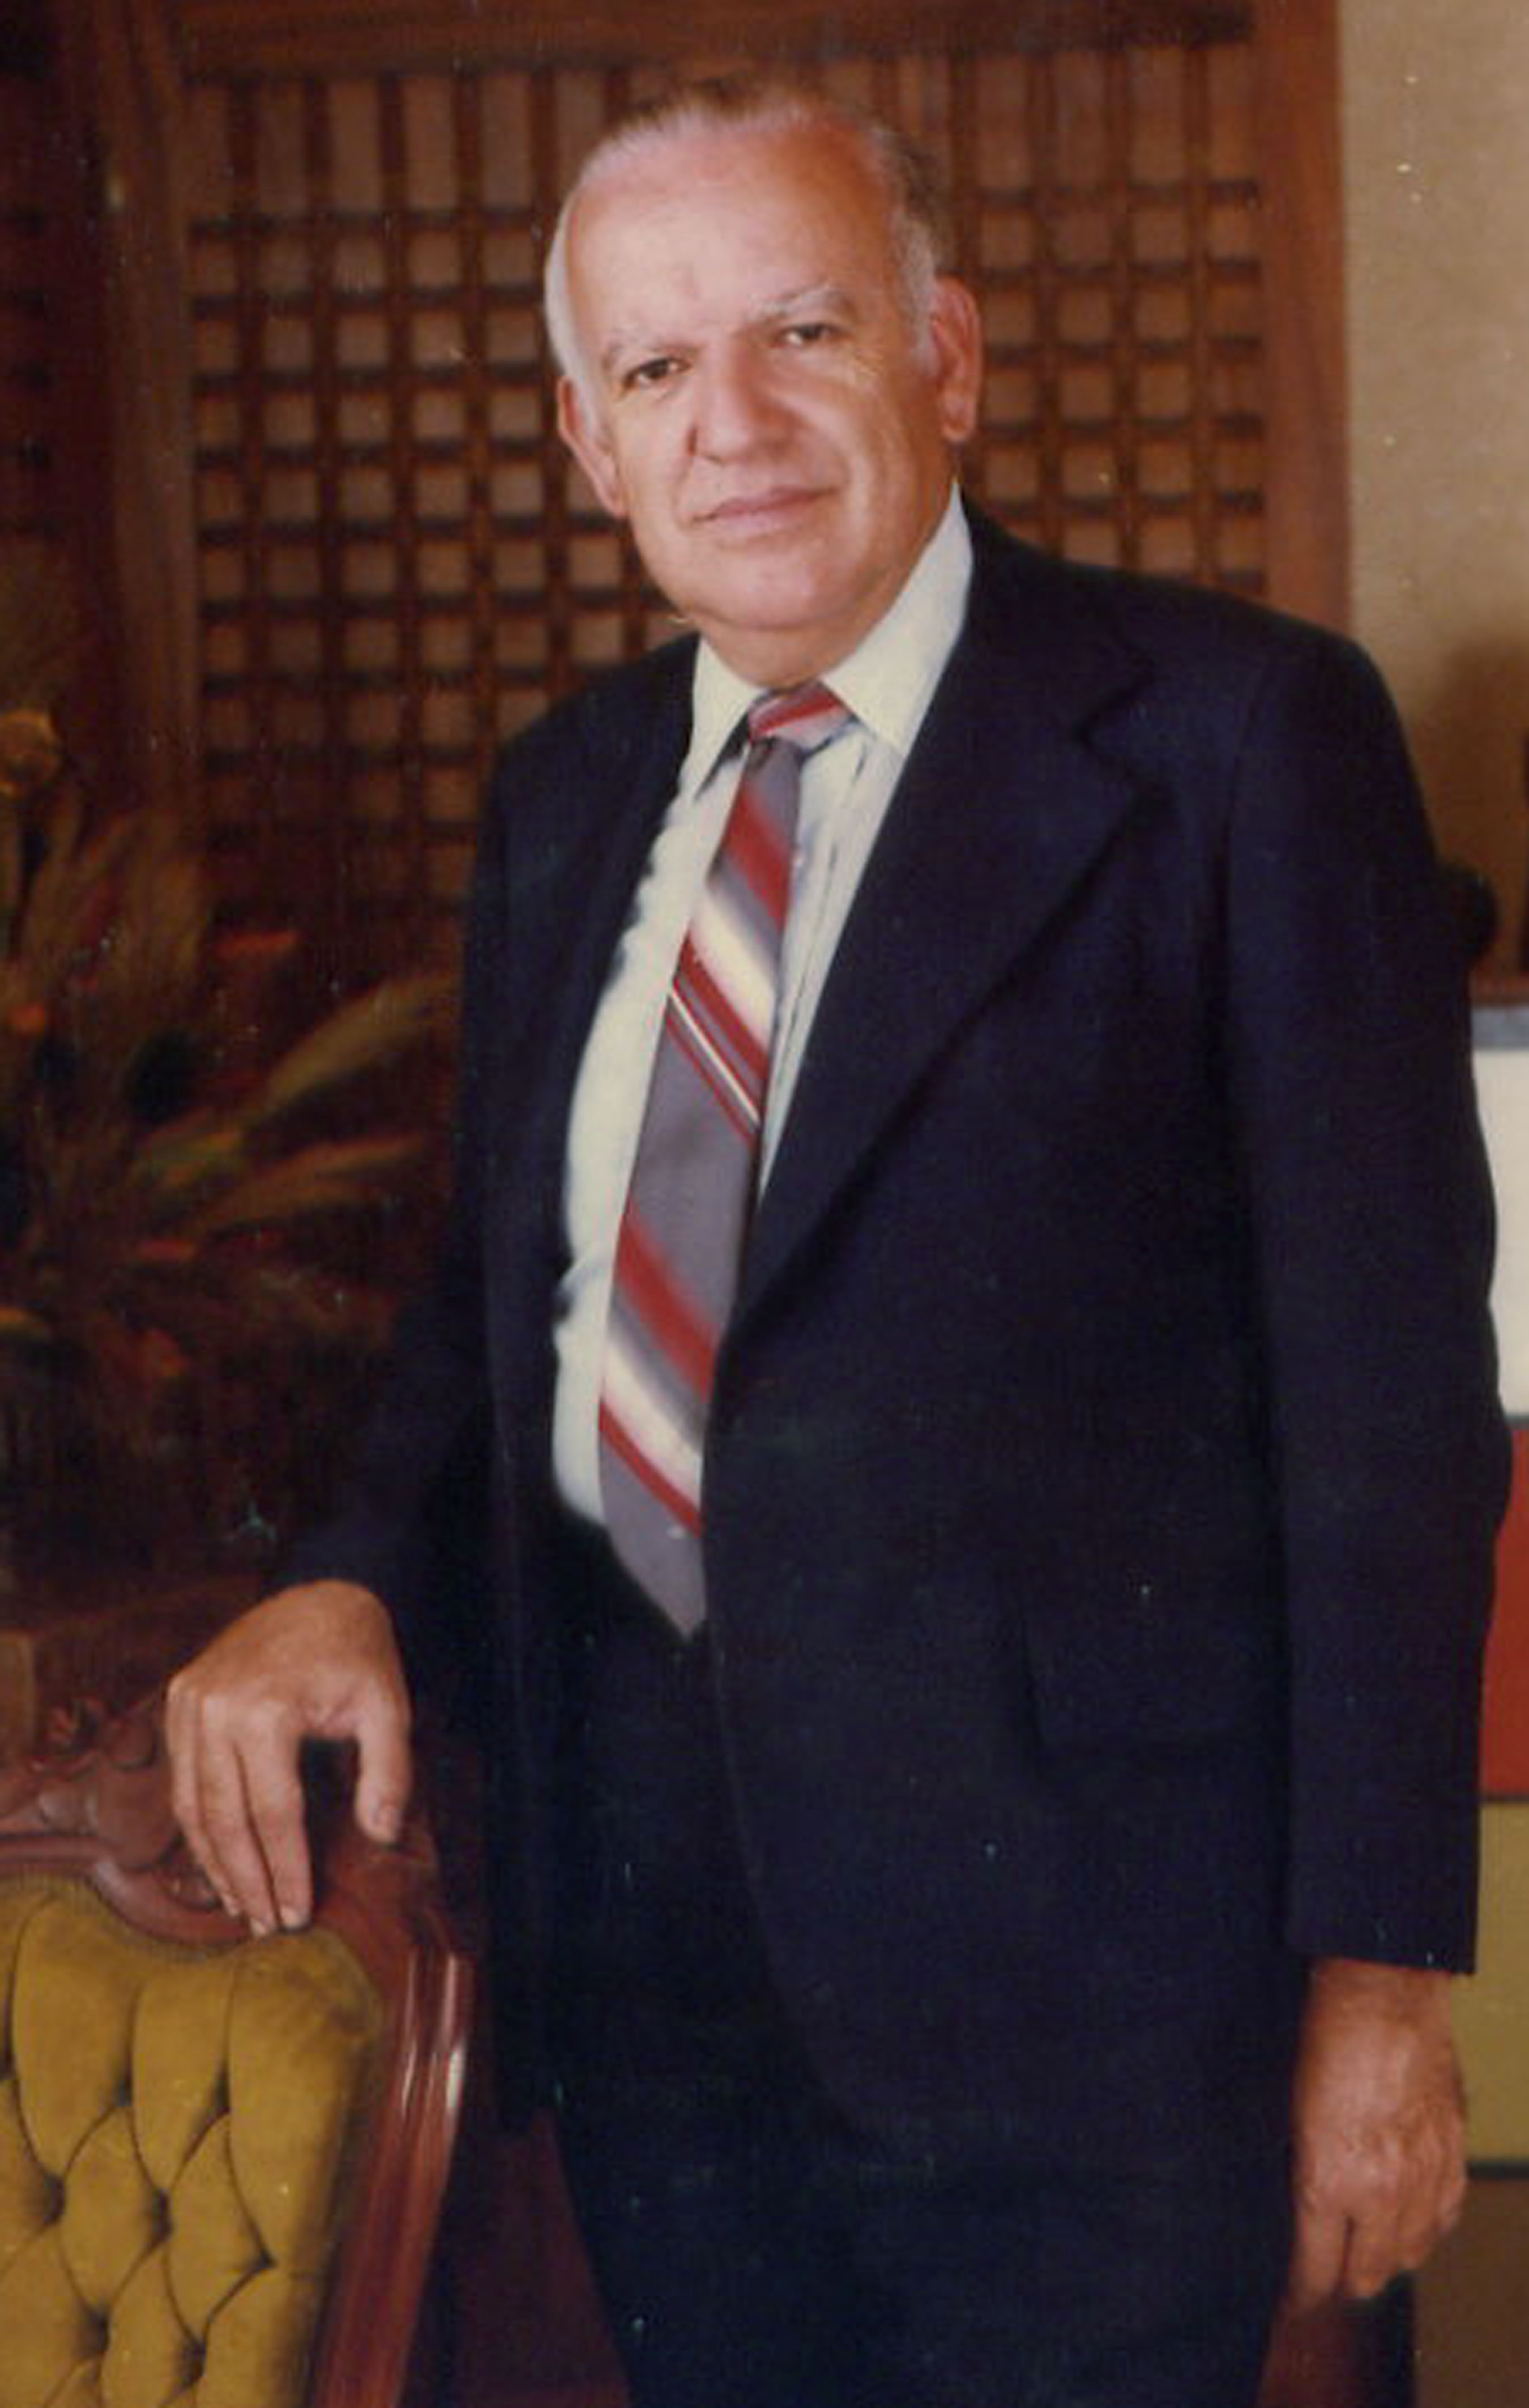 '''Carlos Melendez Chaverri'''